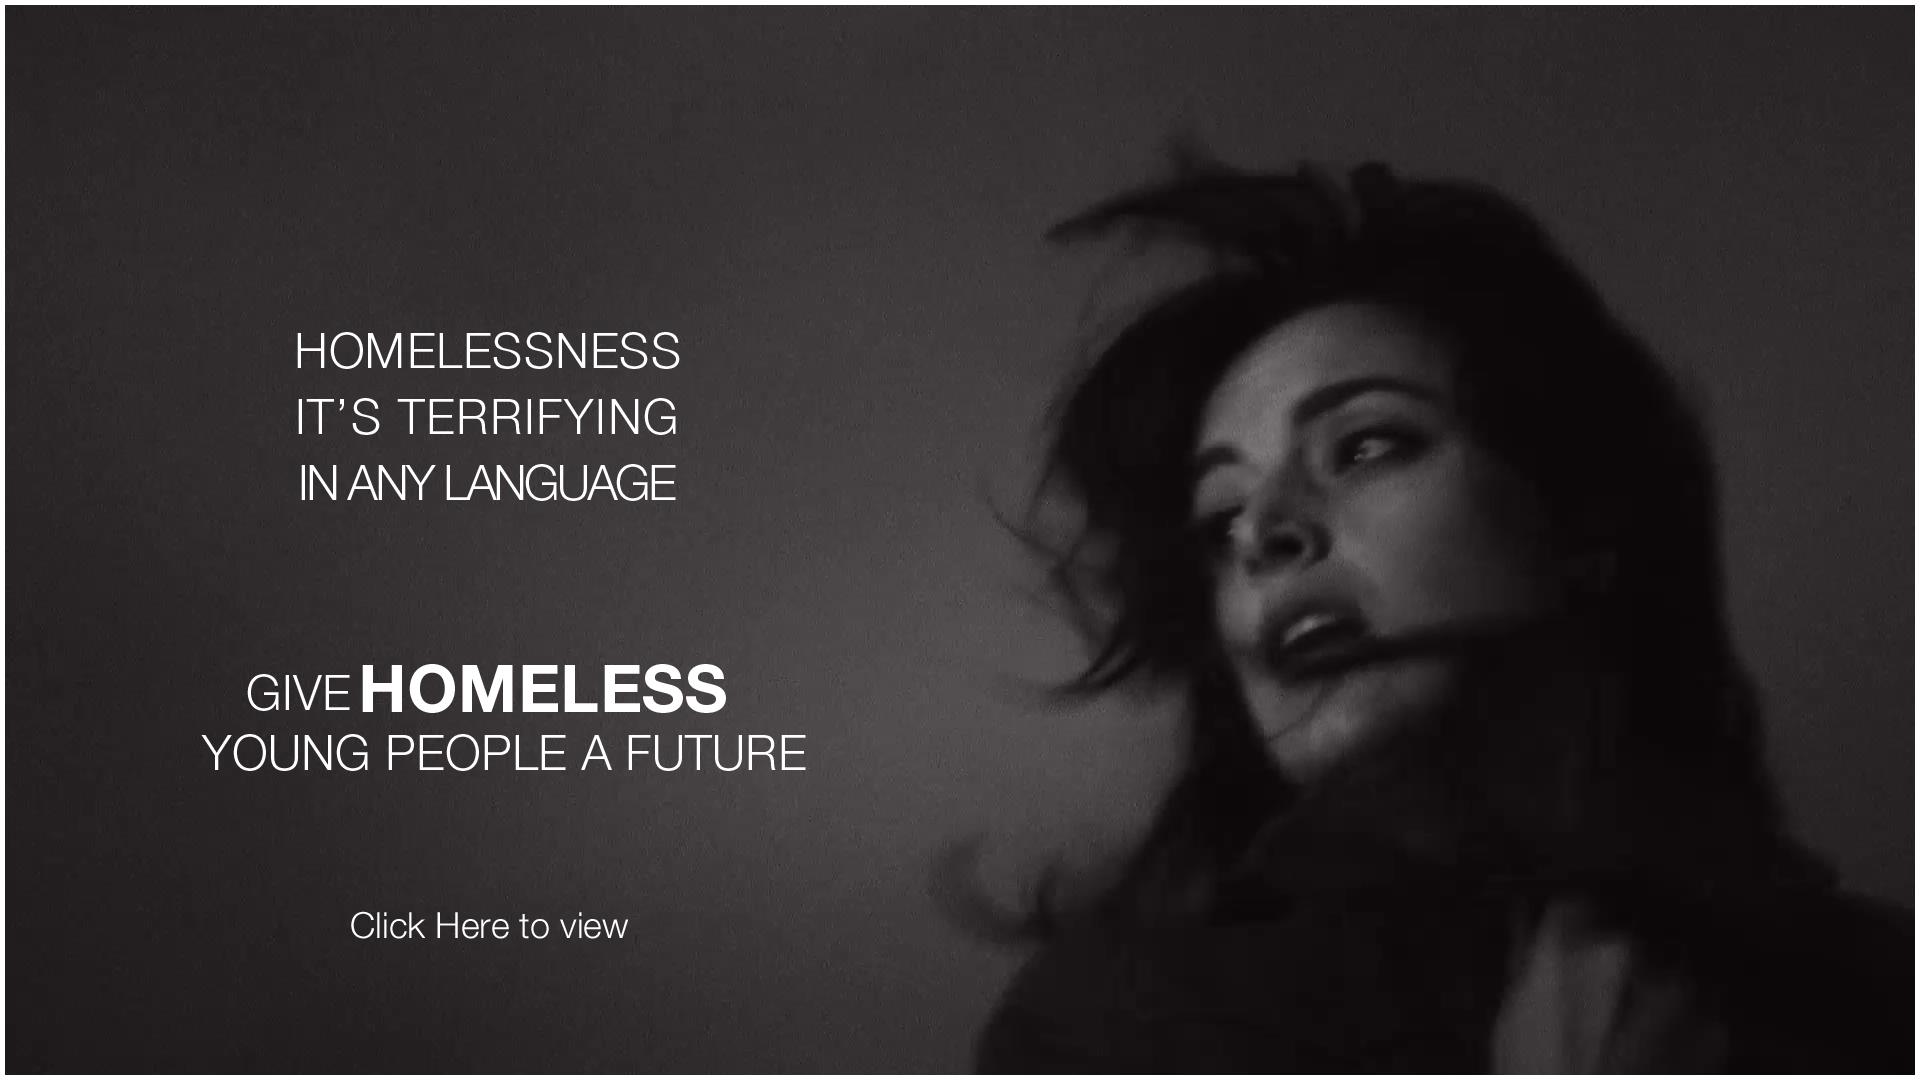 homeless_on_the_run_GRADED_Final_Audio_4-copy.jpg